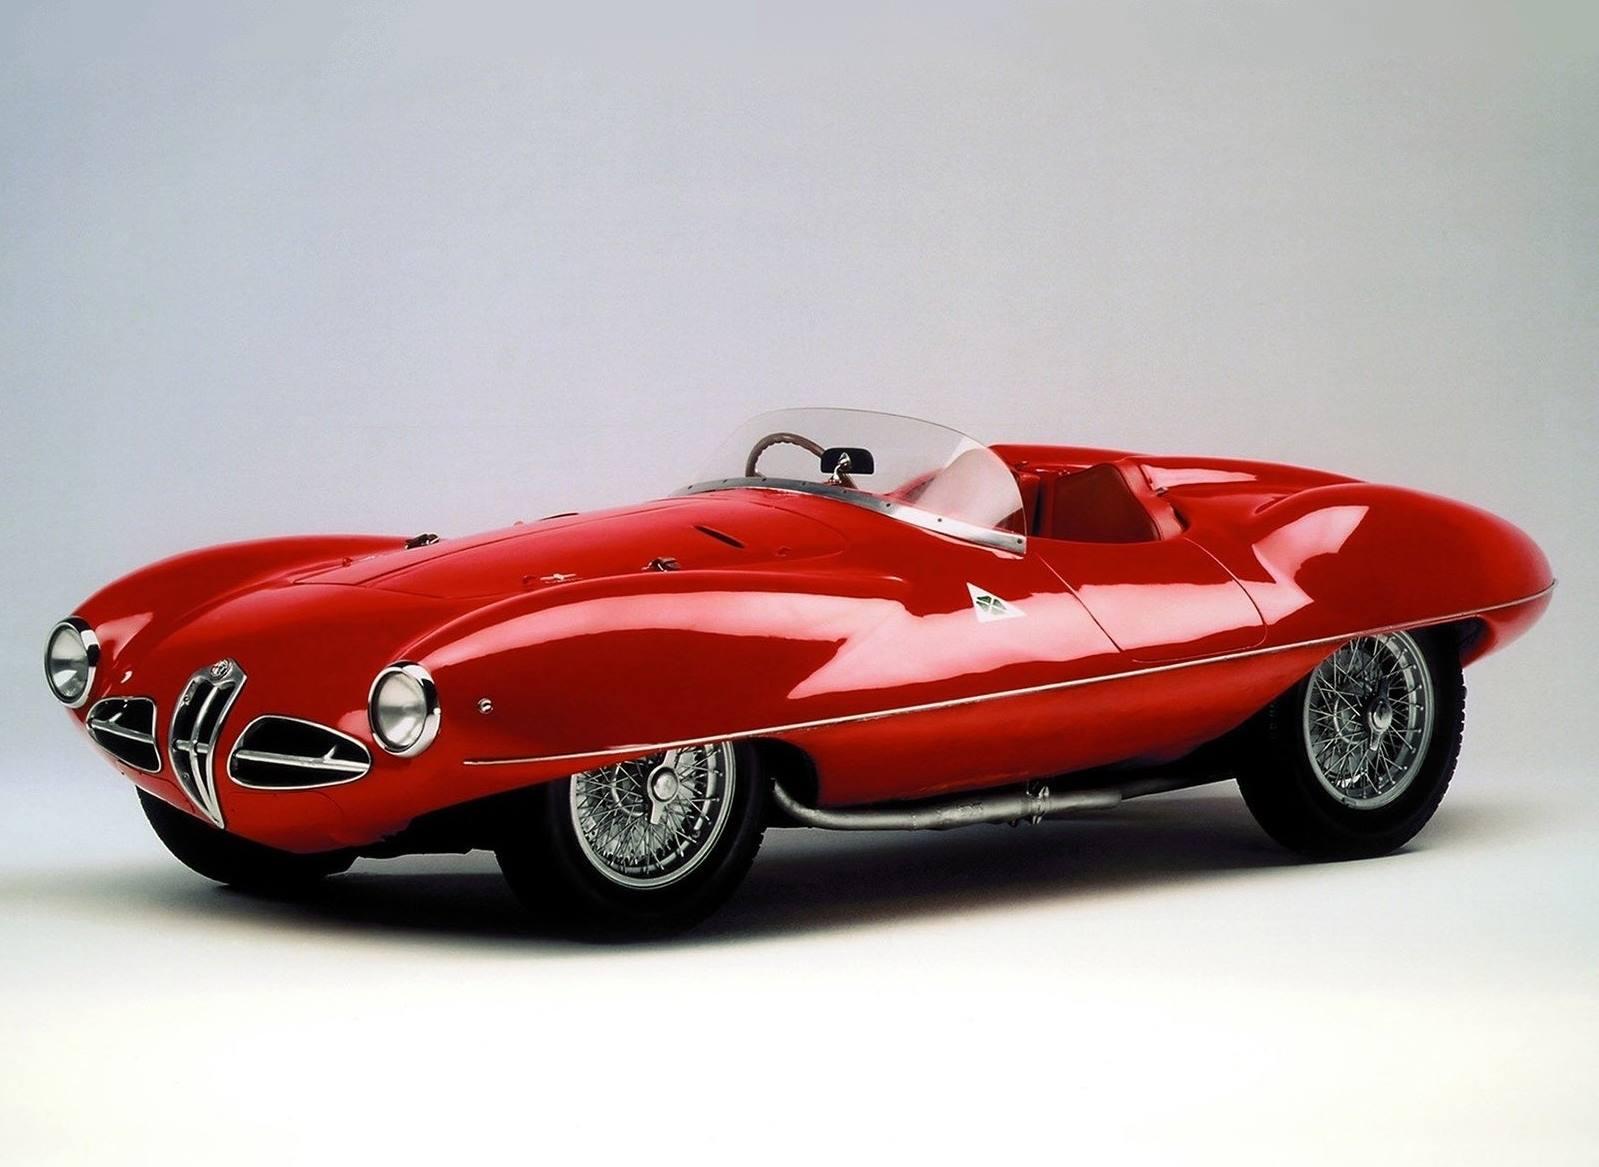 Alfa-Romeo-1900-C52-Disco-Volante-Touring-Spider-1952--1